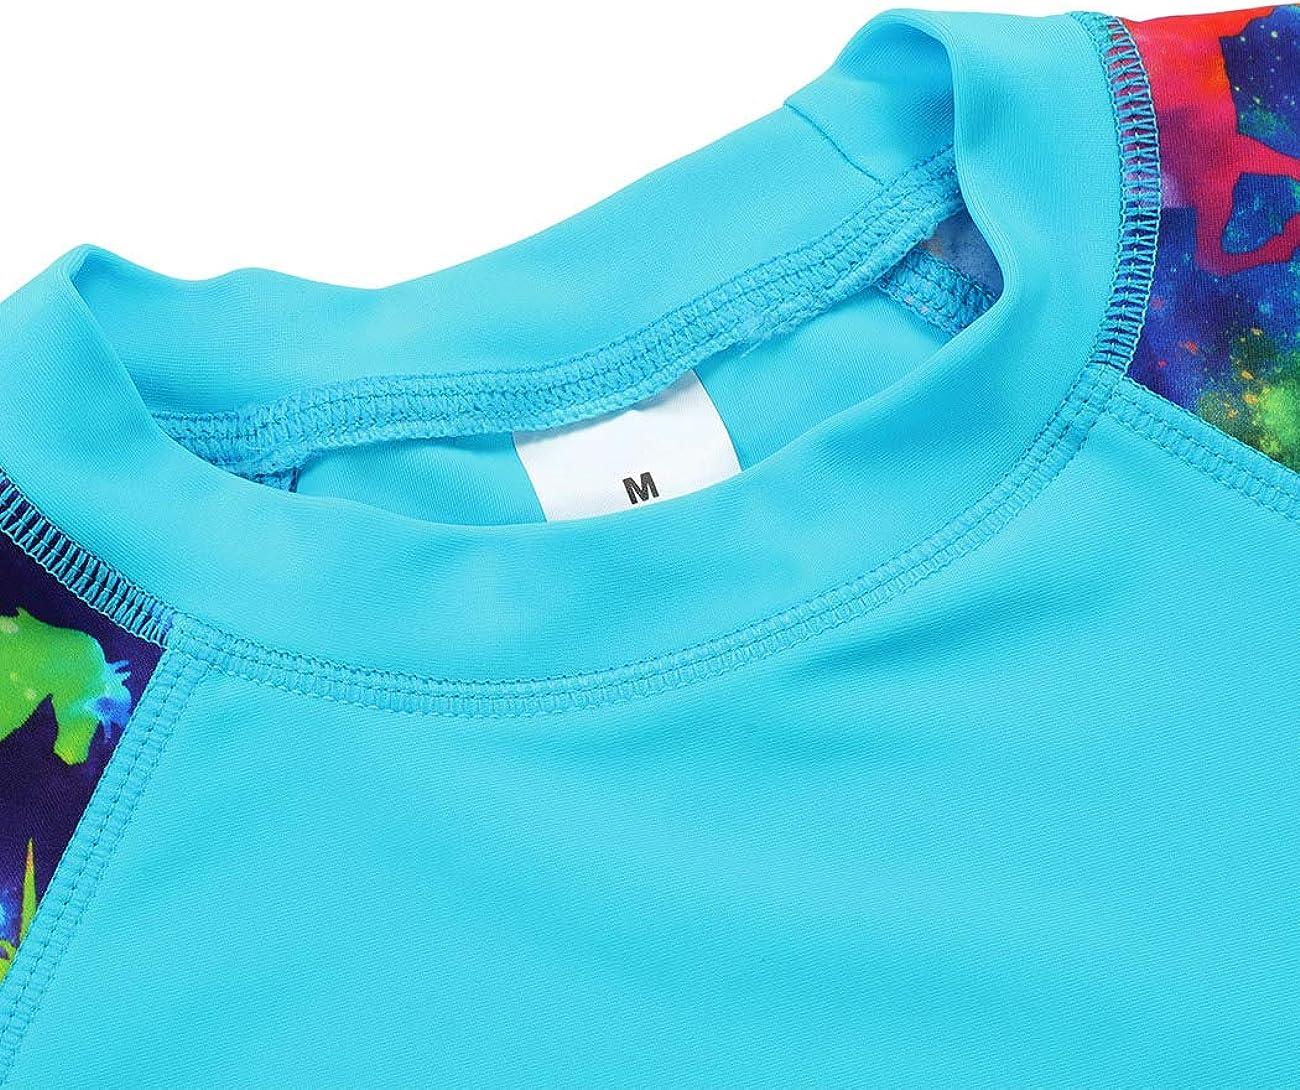 iDrawl Unisex Kids Short Sleeve Rash Guards Retro Floral Printed Rash Vest with Drawstring Bottom UPF 50 for Age of 4 to 14